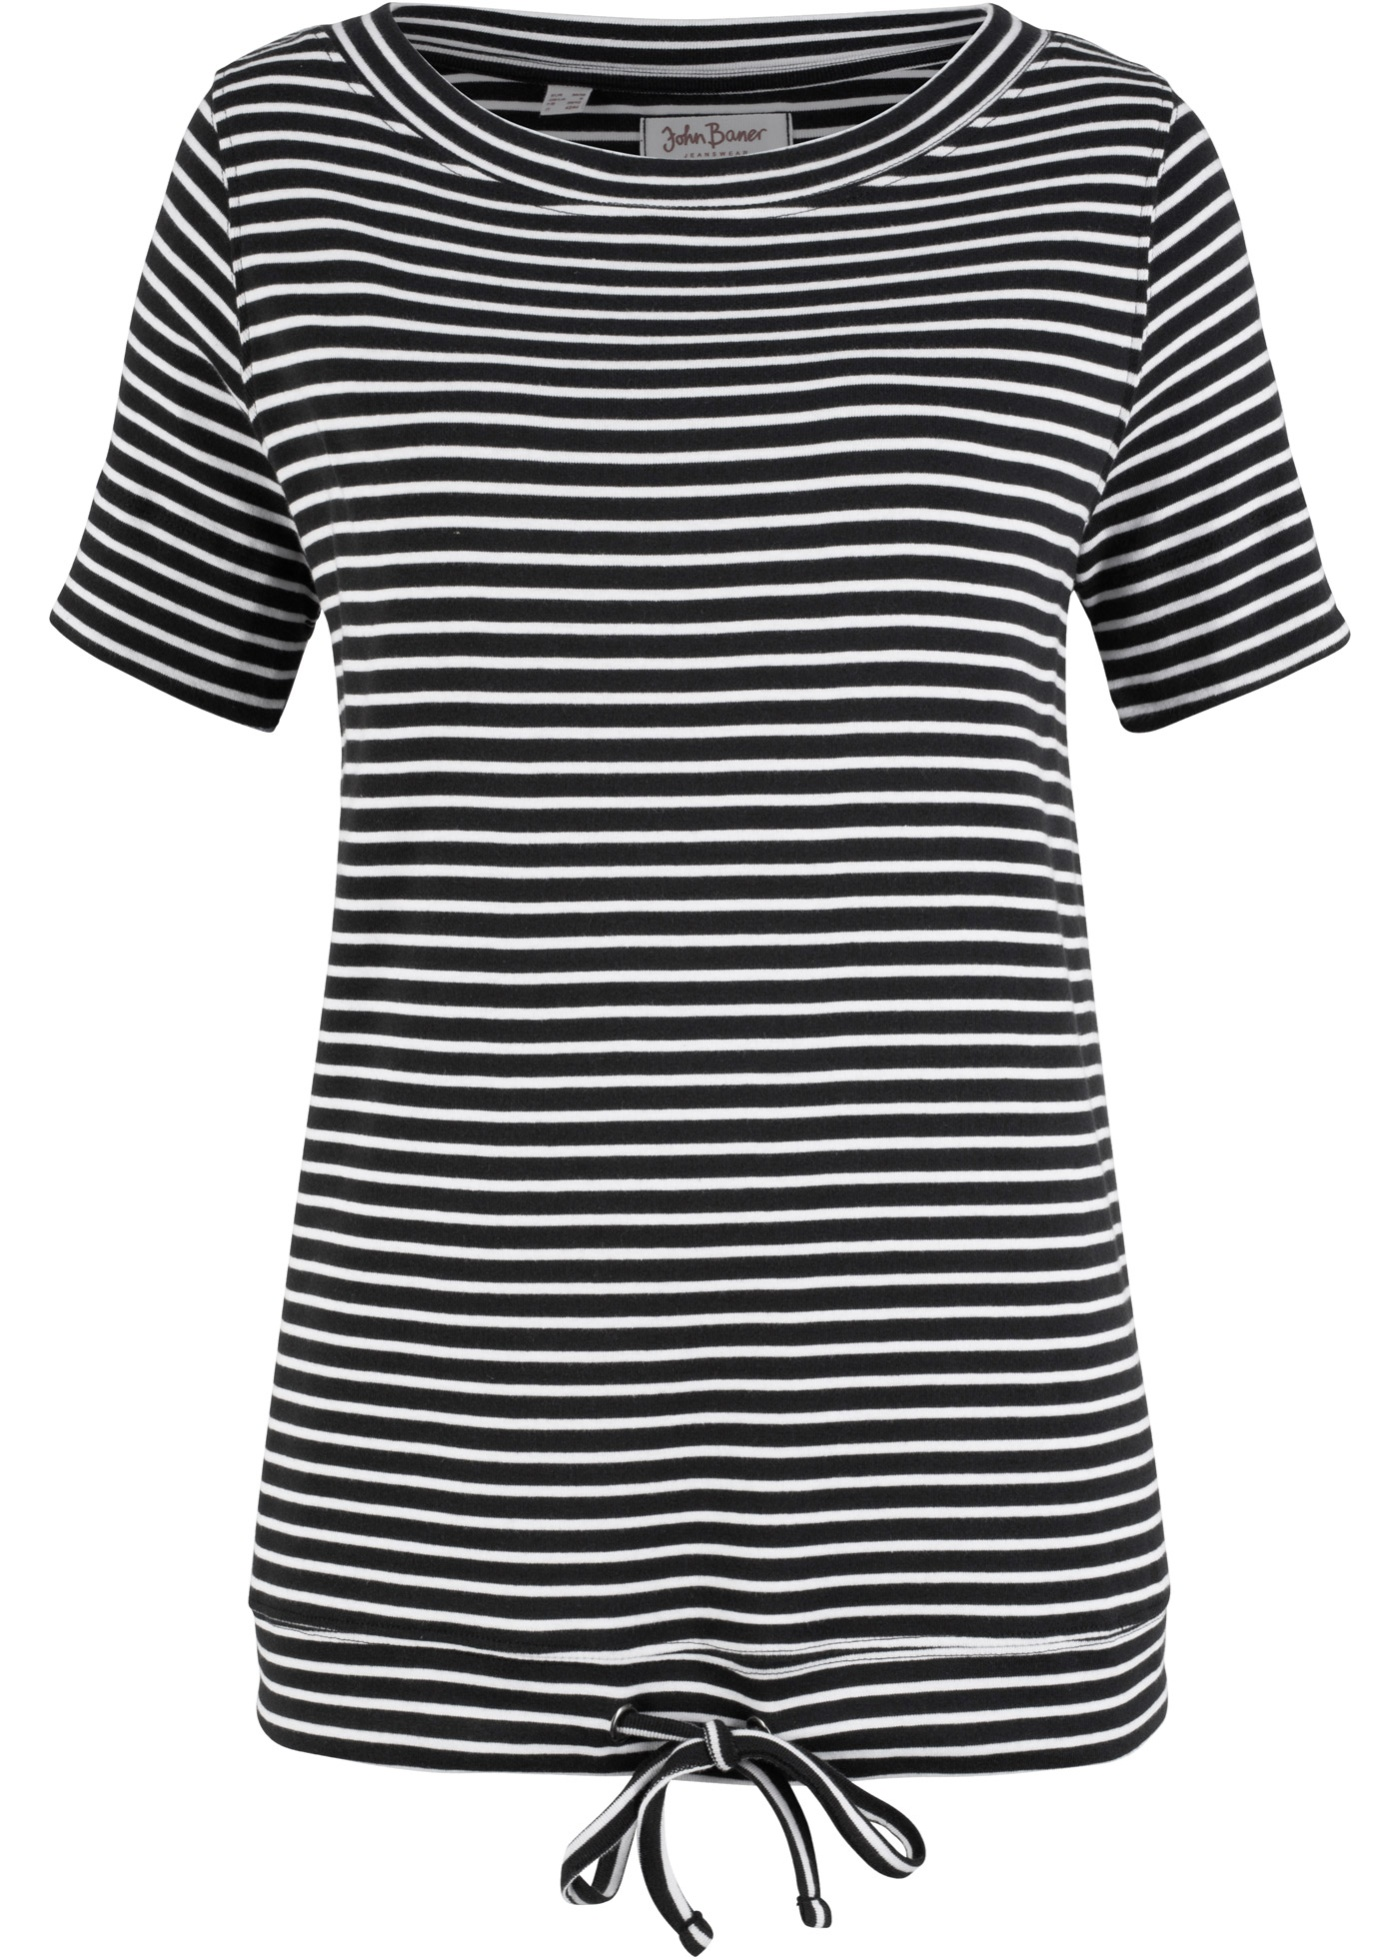 shirt 2 Femme Manches Pour Rayé John 1 Baner Noir Jeanswear BonprixT 4A5Rq3jL